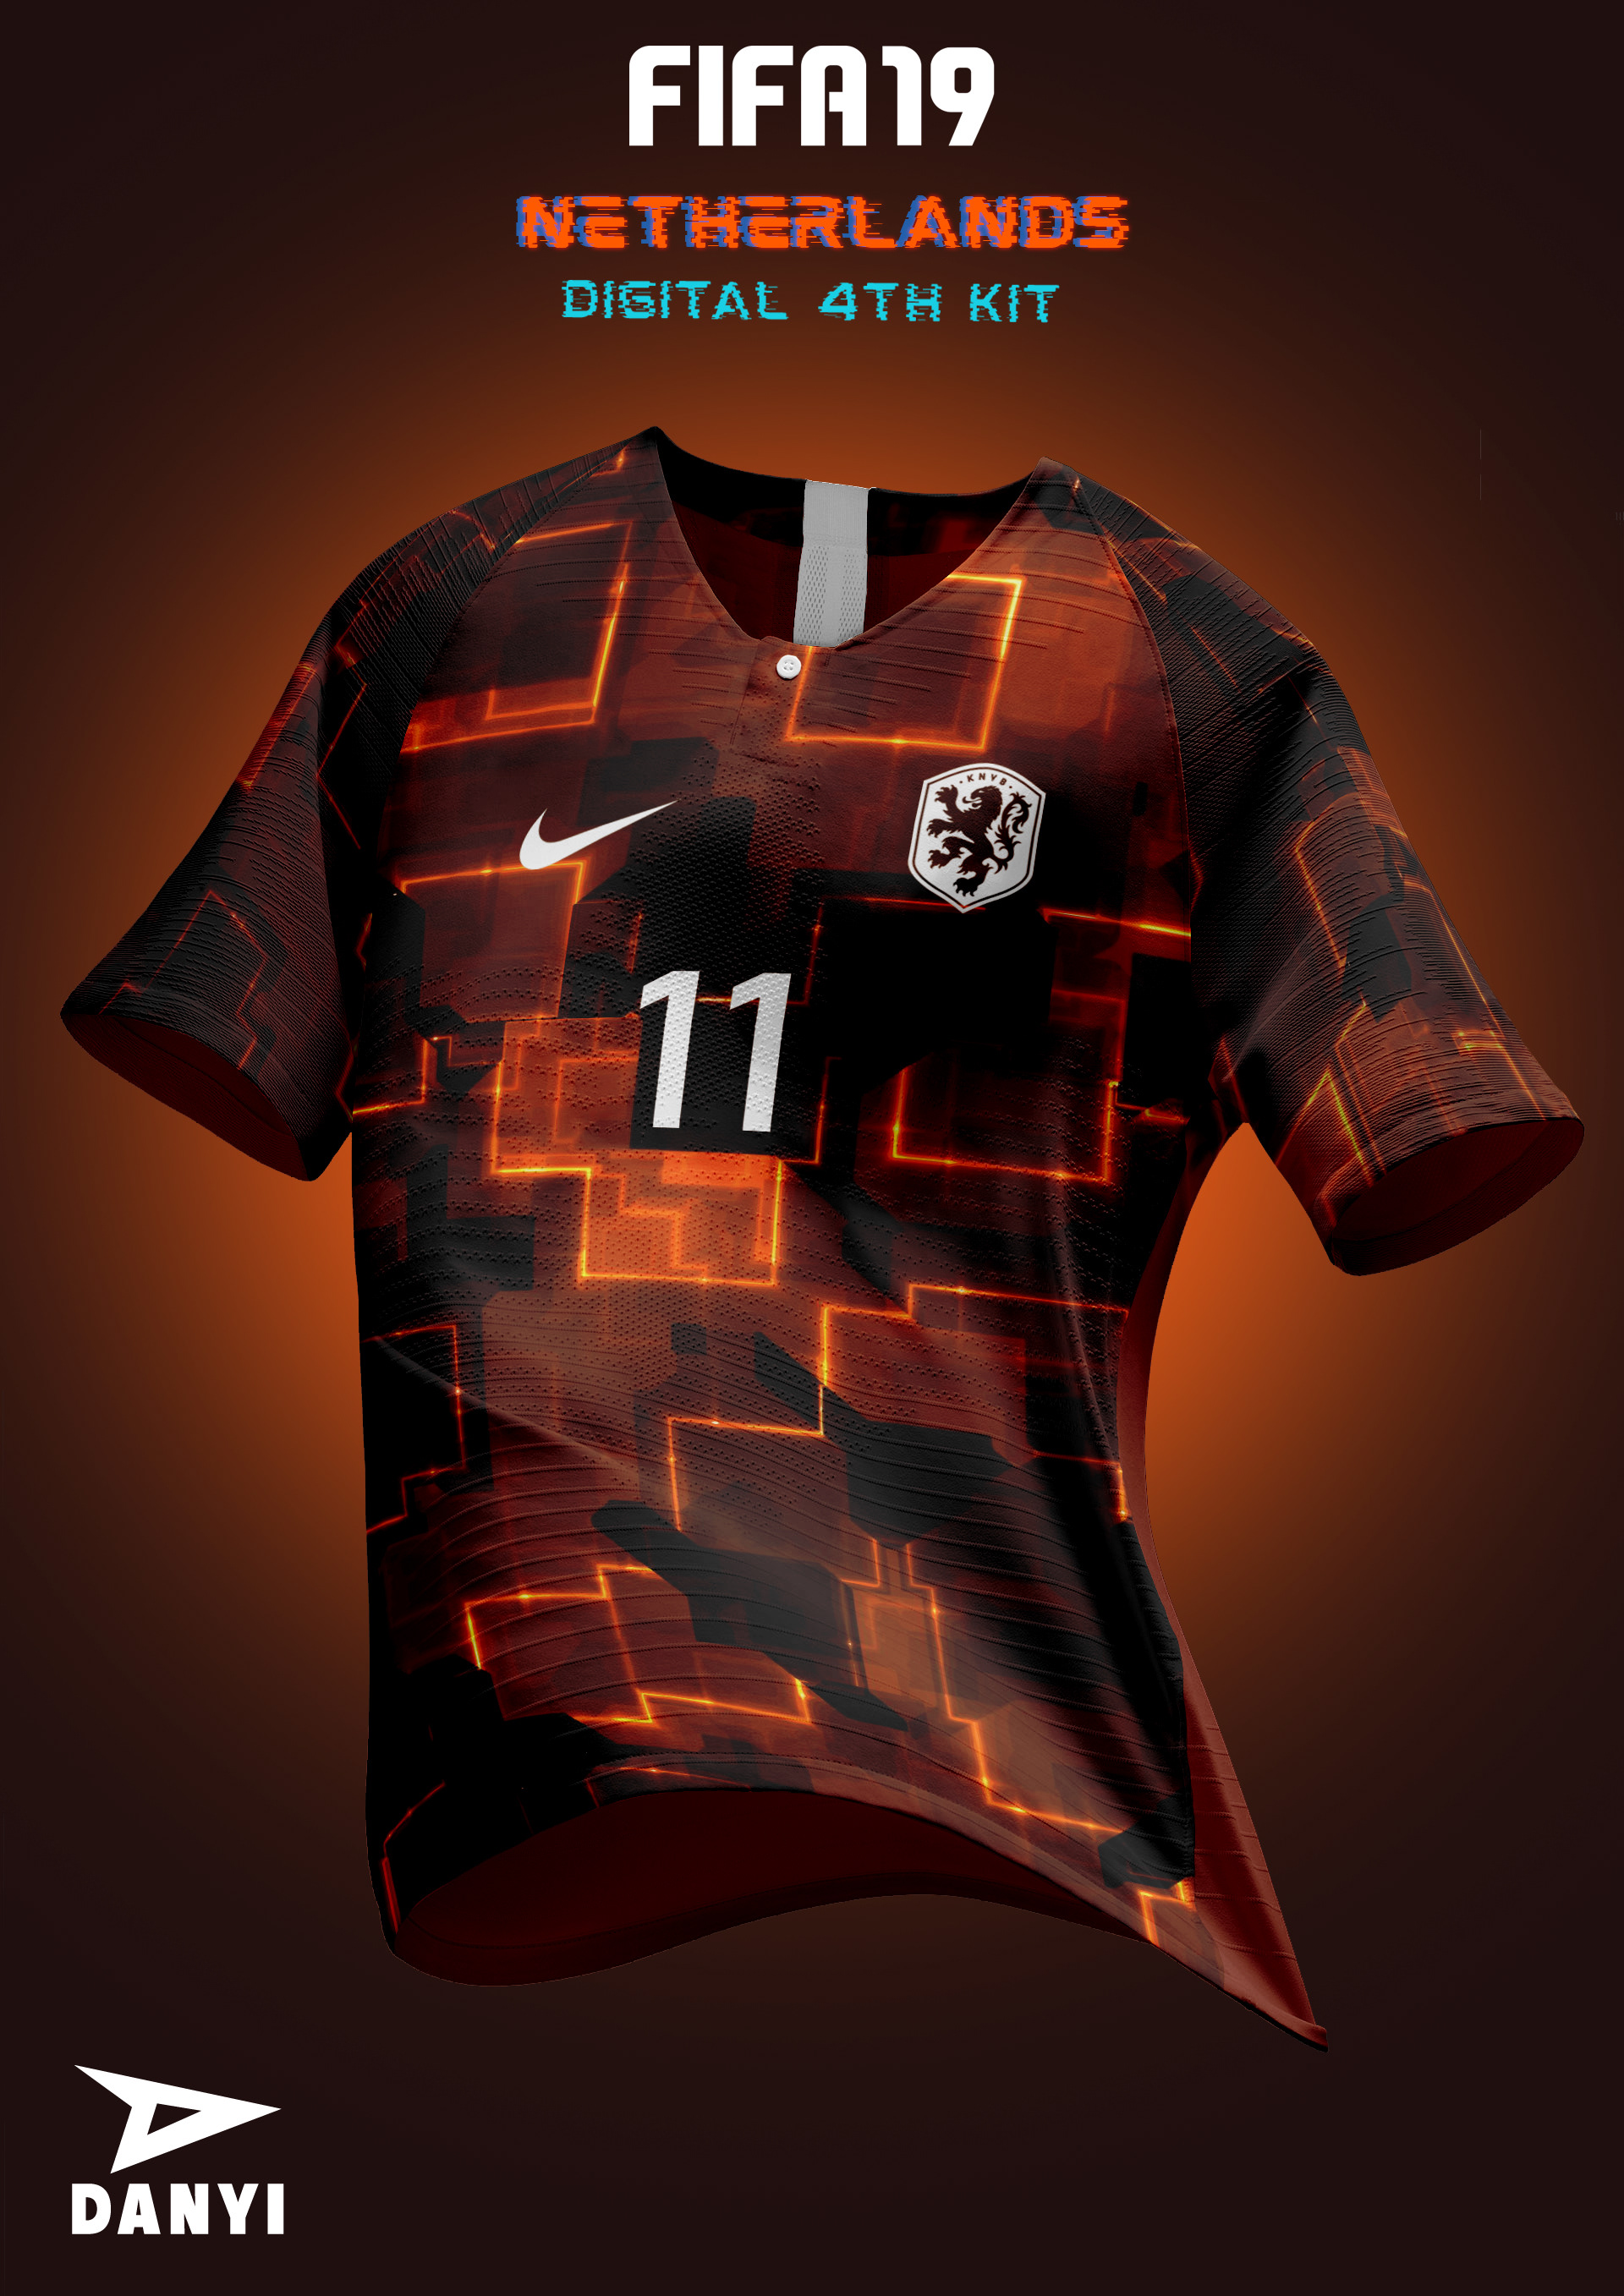 newest 8fc3a c5f03 FIFA 19 X NIKE football kits. on Behance